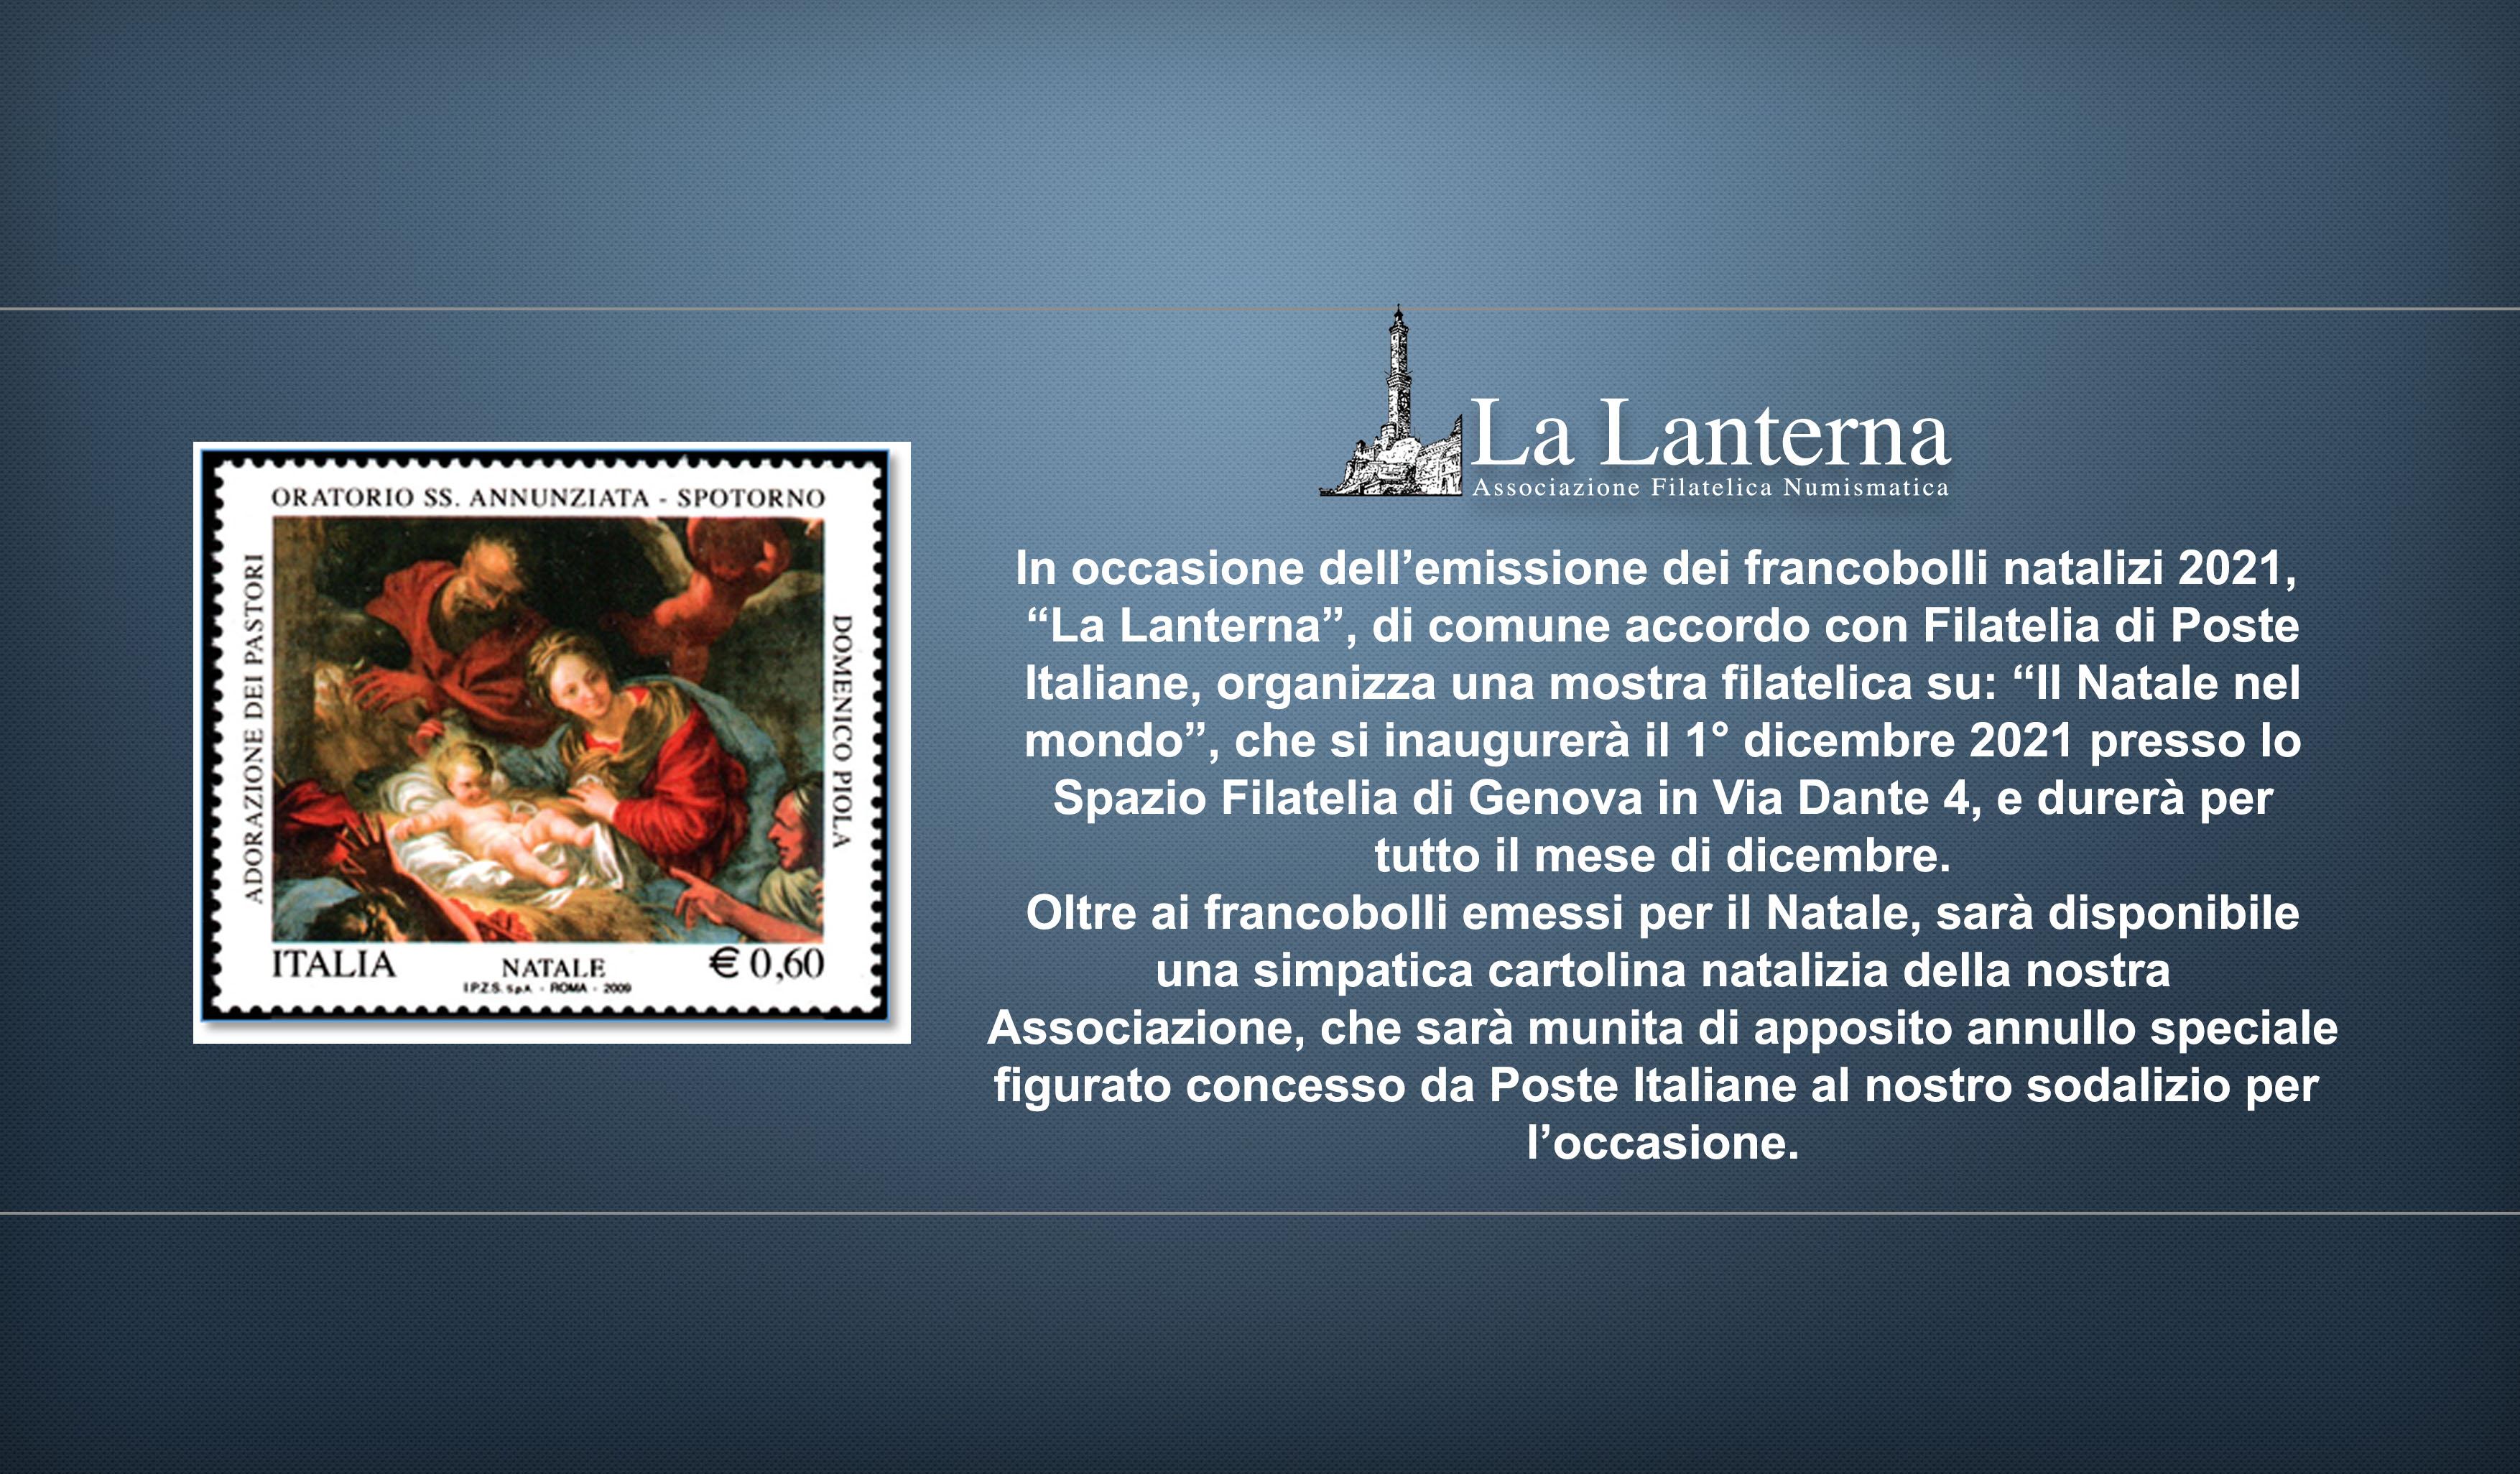 LANTERNA francobolli